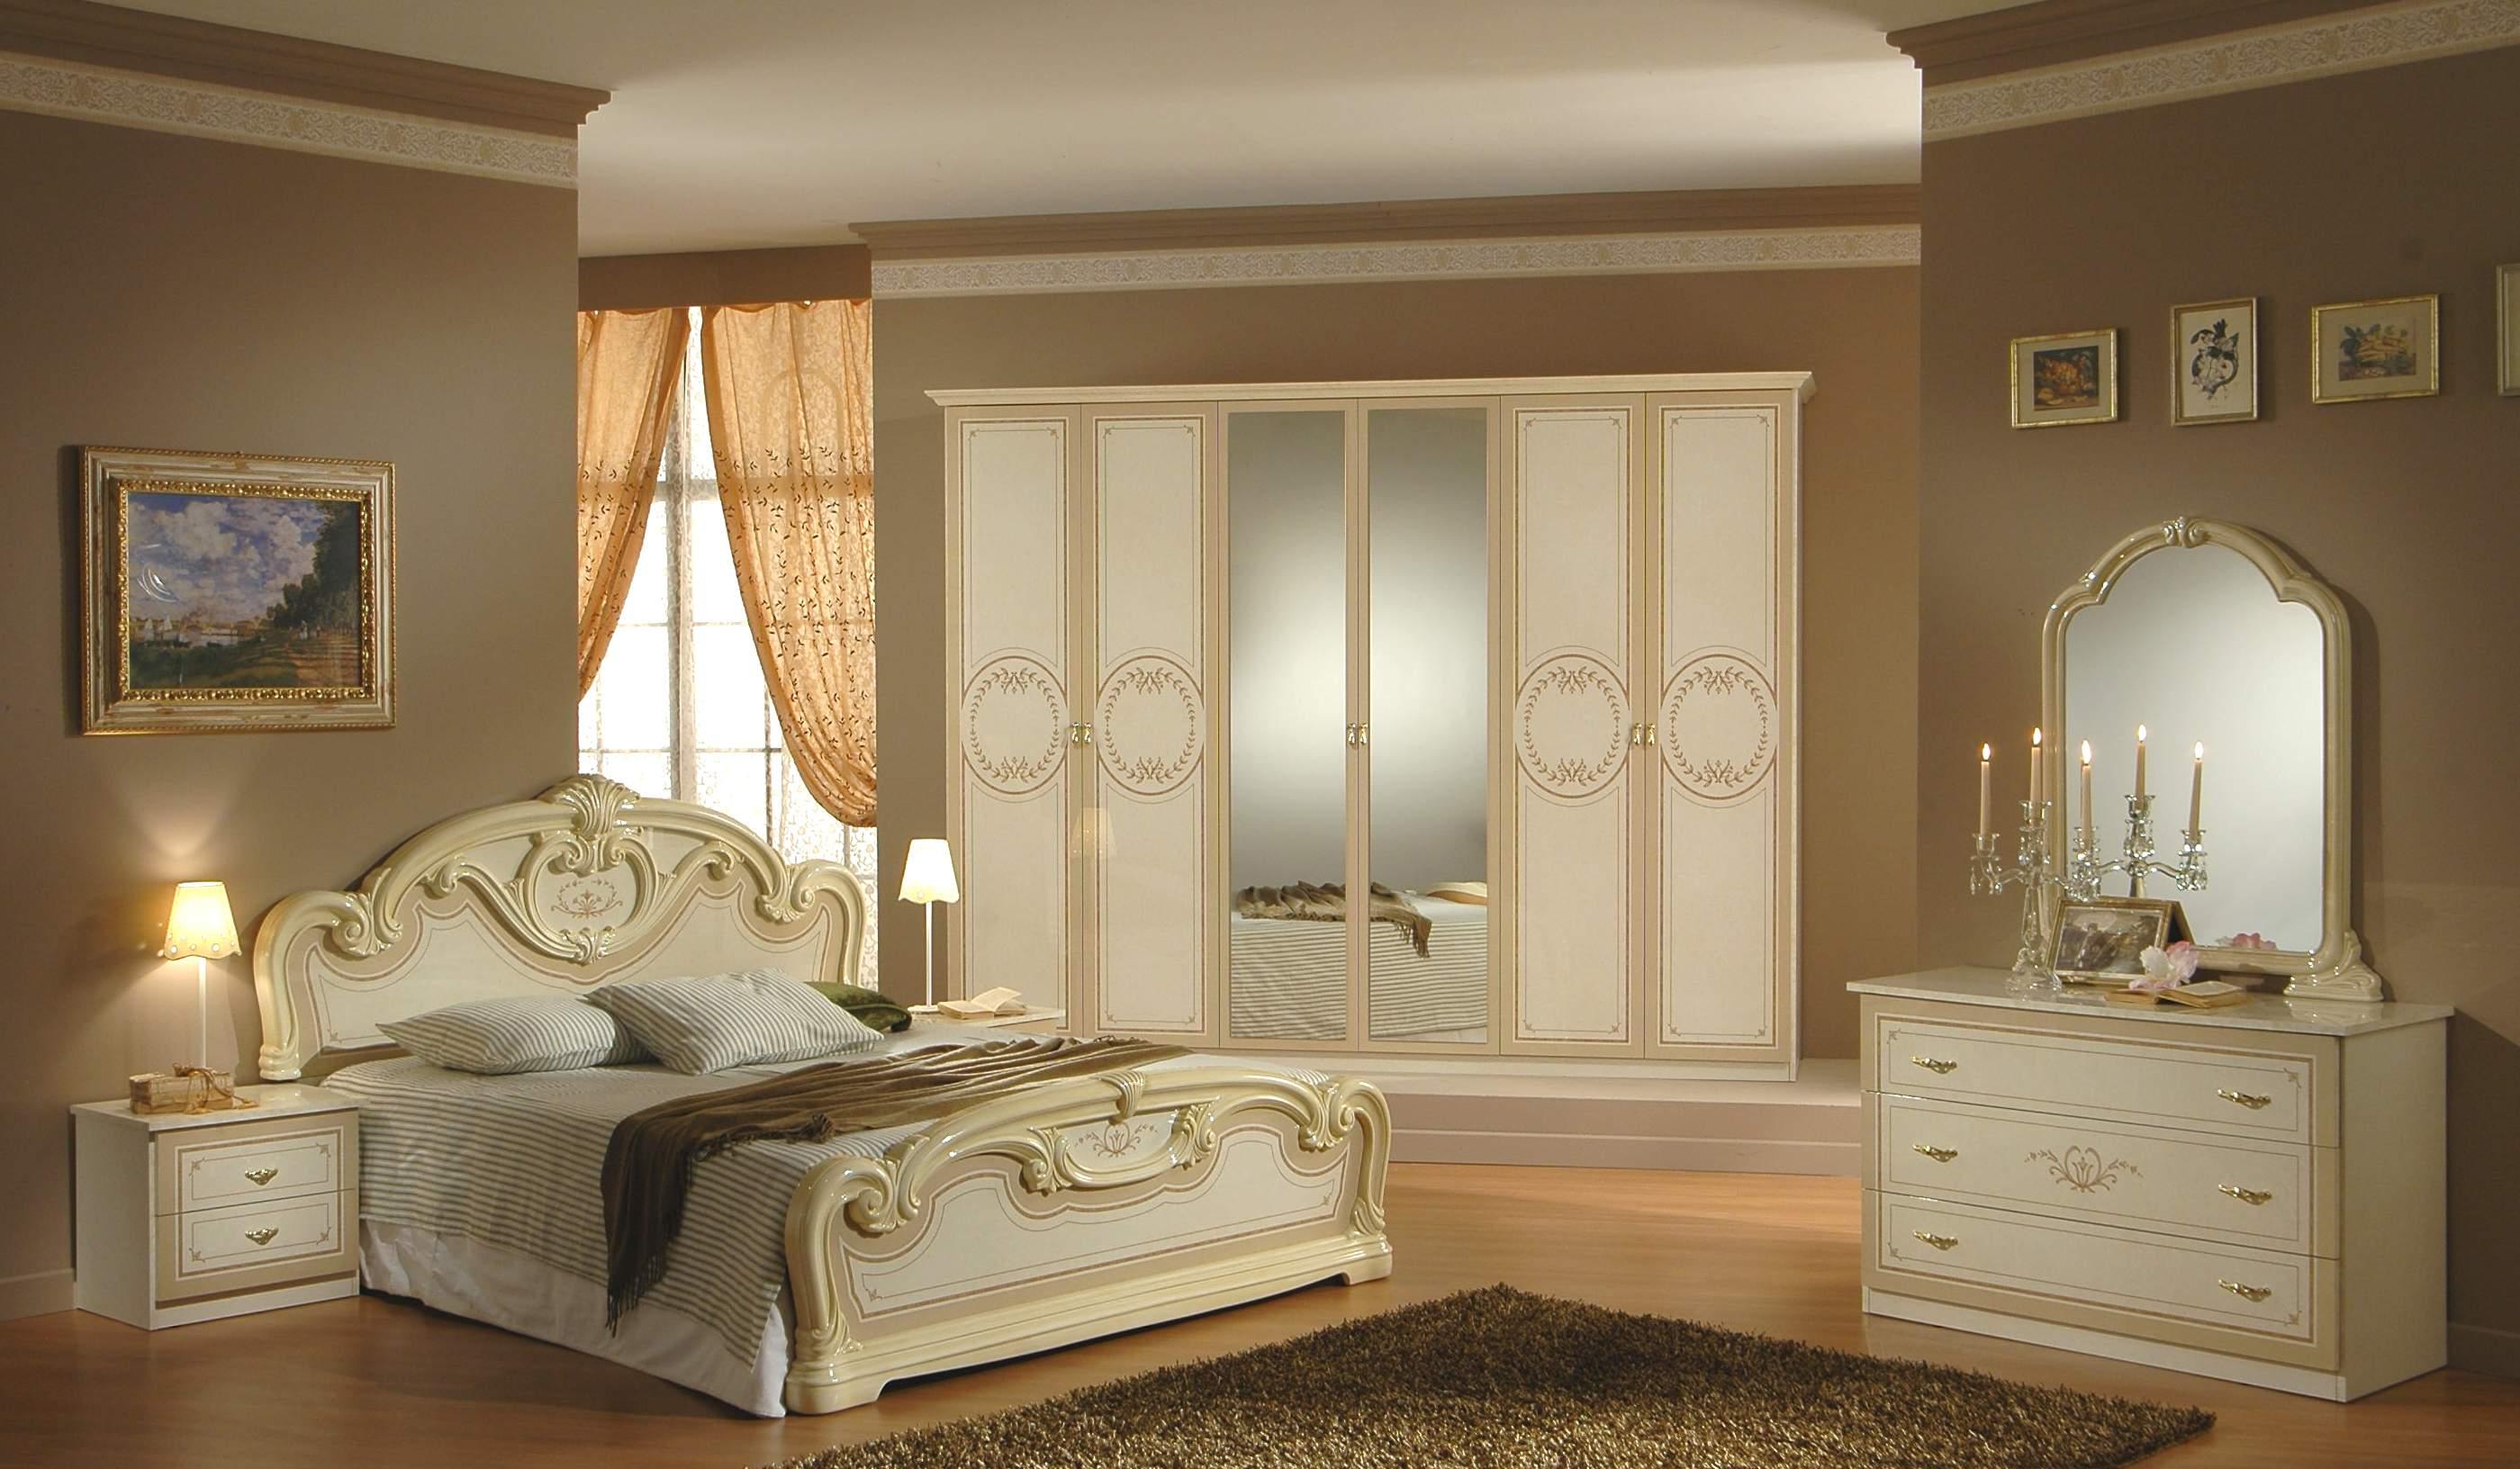 Matrimonio Rustico Queen : احدث غرف نوم بديكورات مودرن وكلاسيك سوبر كايرو